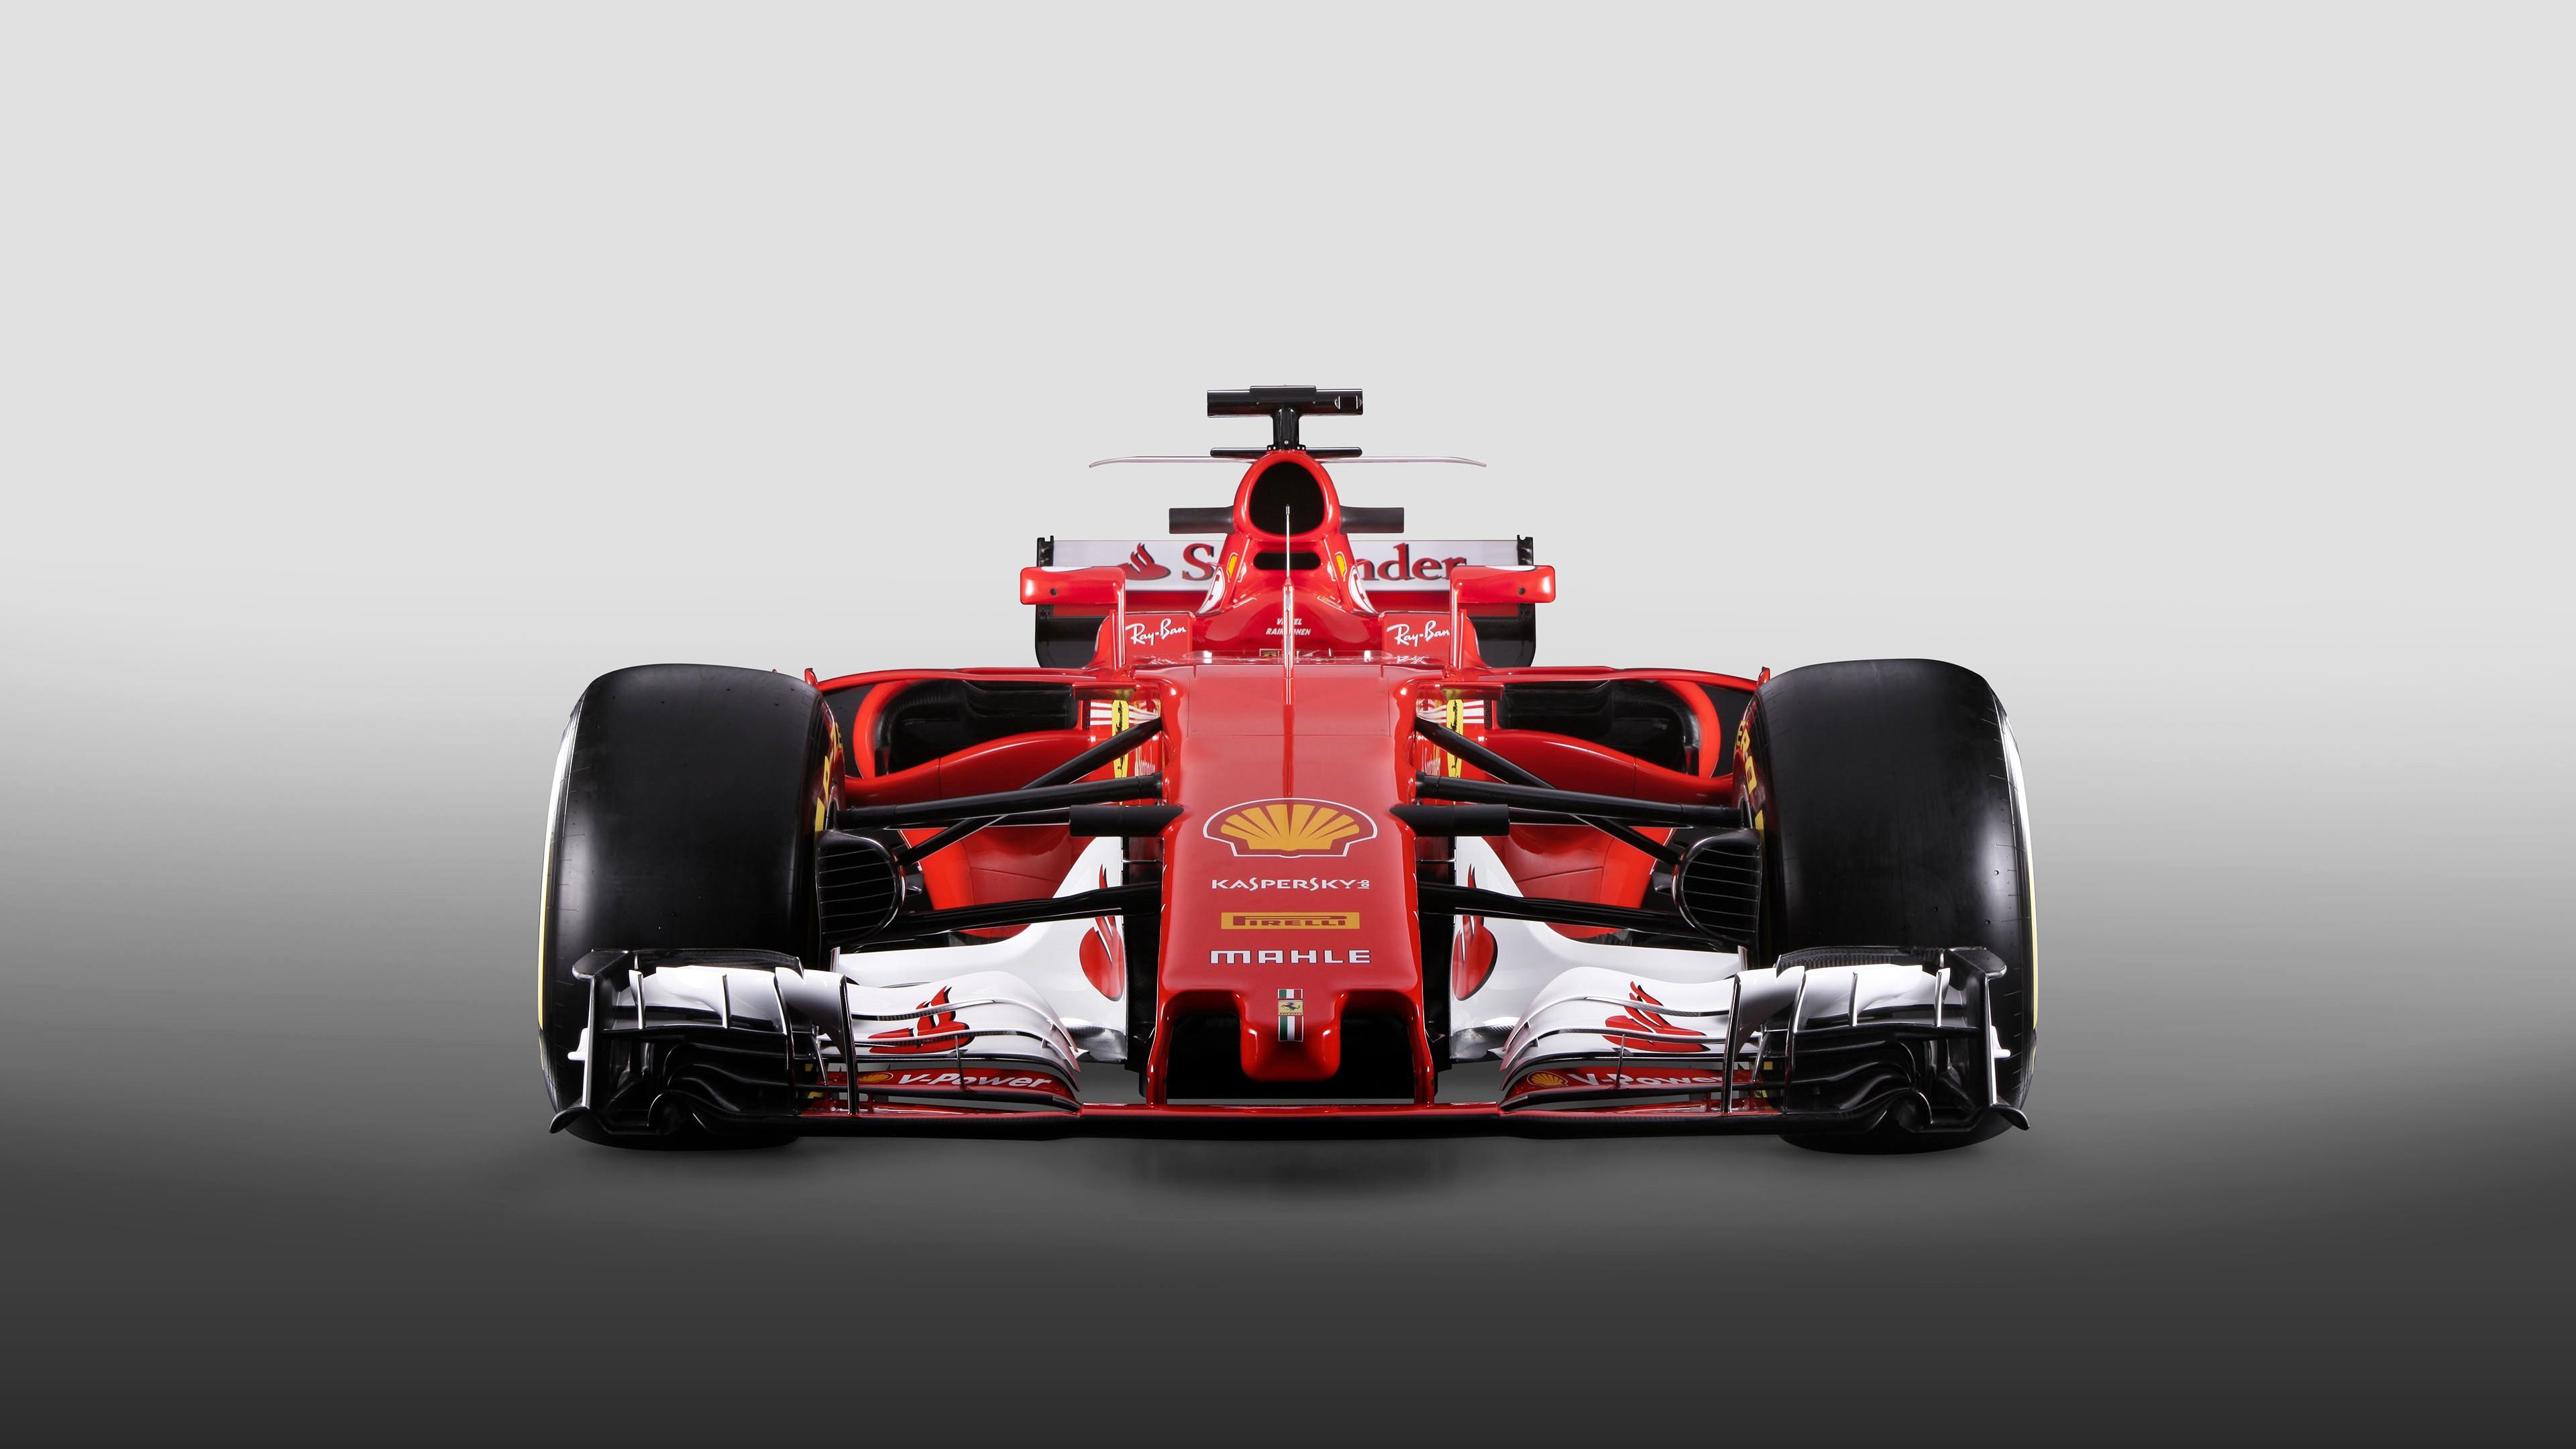 Red Bull Wallpaper Hd Iphone 2017 Ferrari Sf70h Formula 1 Car 4k Wallpapers Hd